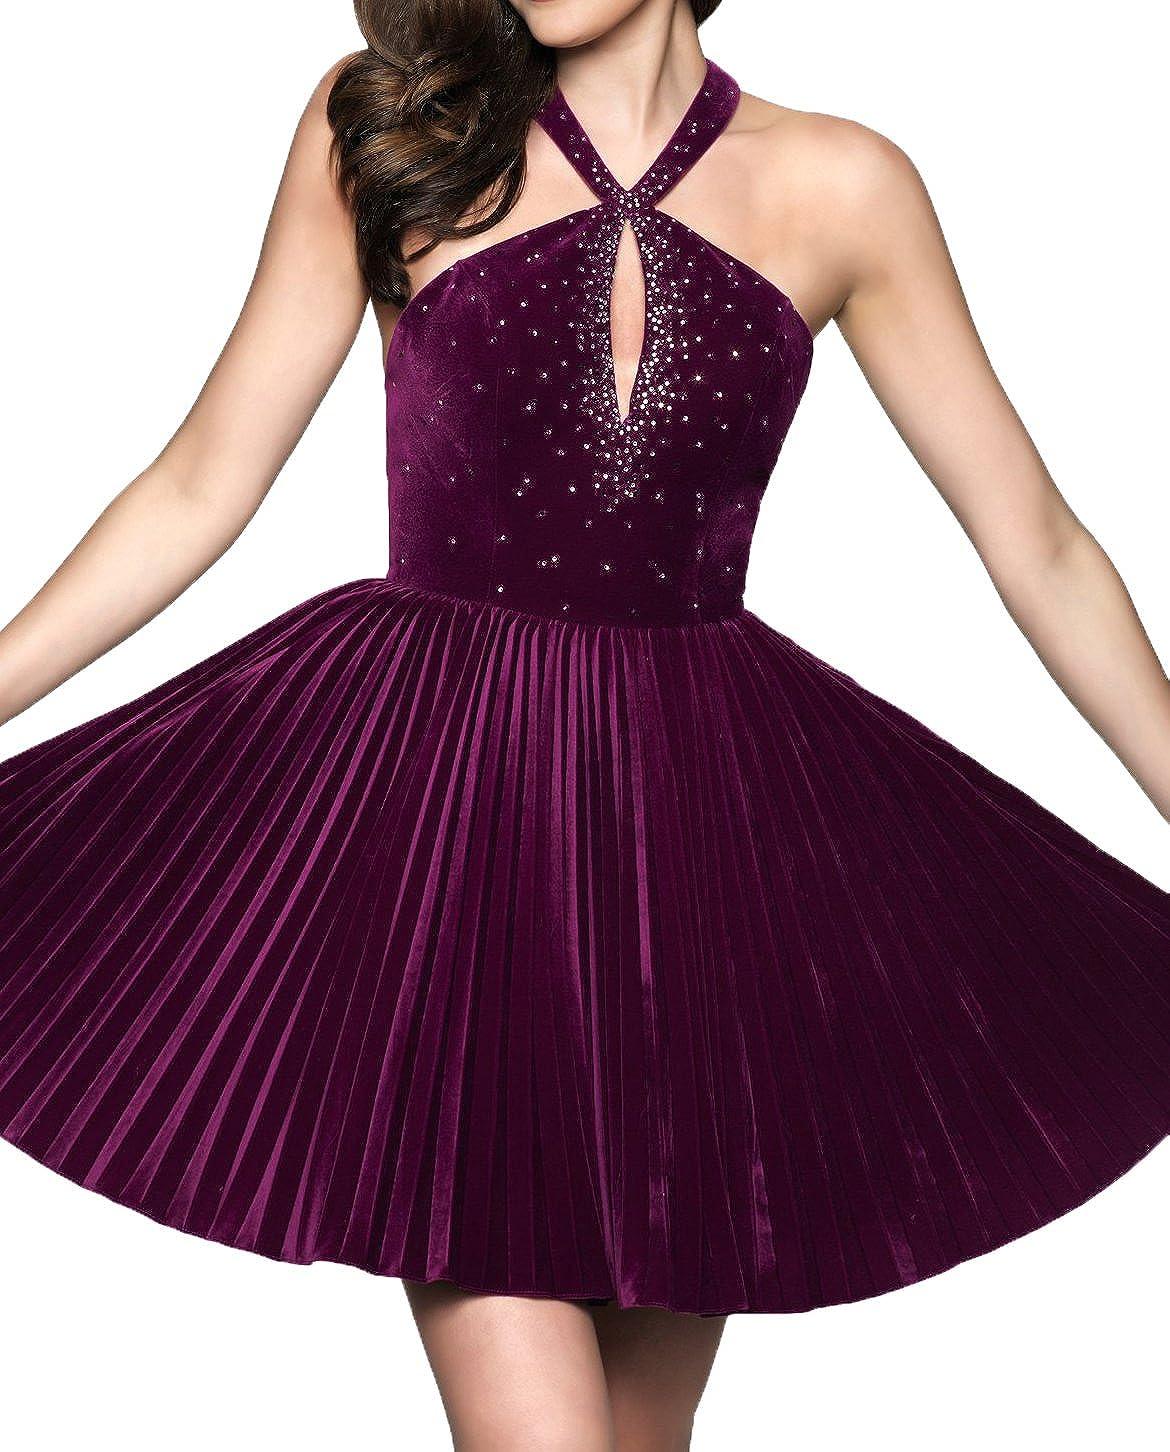 Asoiree Womens Velvet Beaded Pleated Homecoming Prom Dress